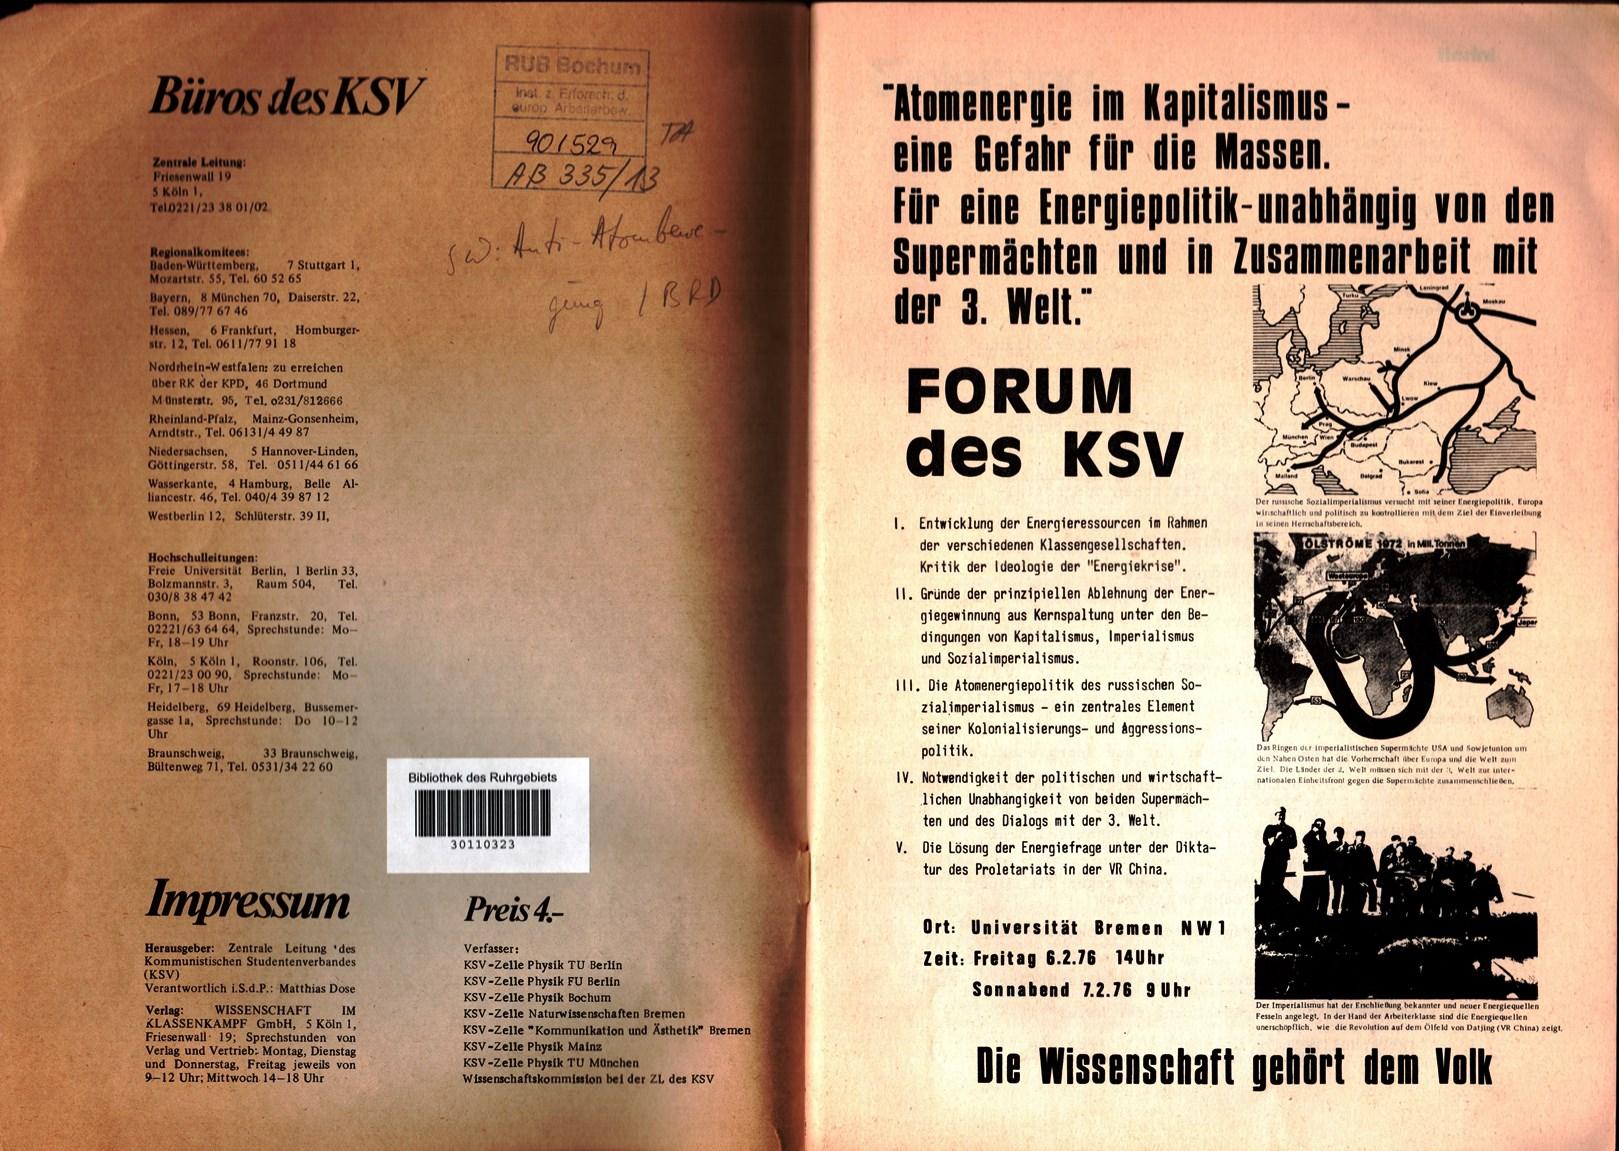 KSV_1976_Atomenergie_im_Kapitalismus_002